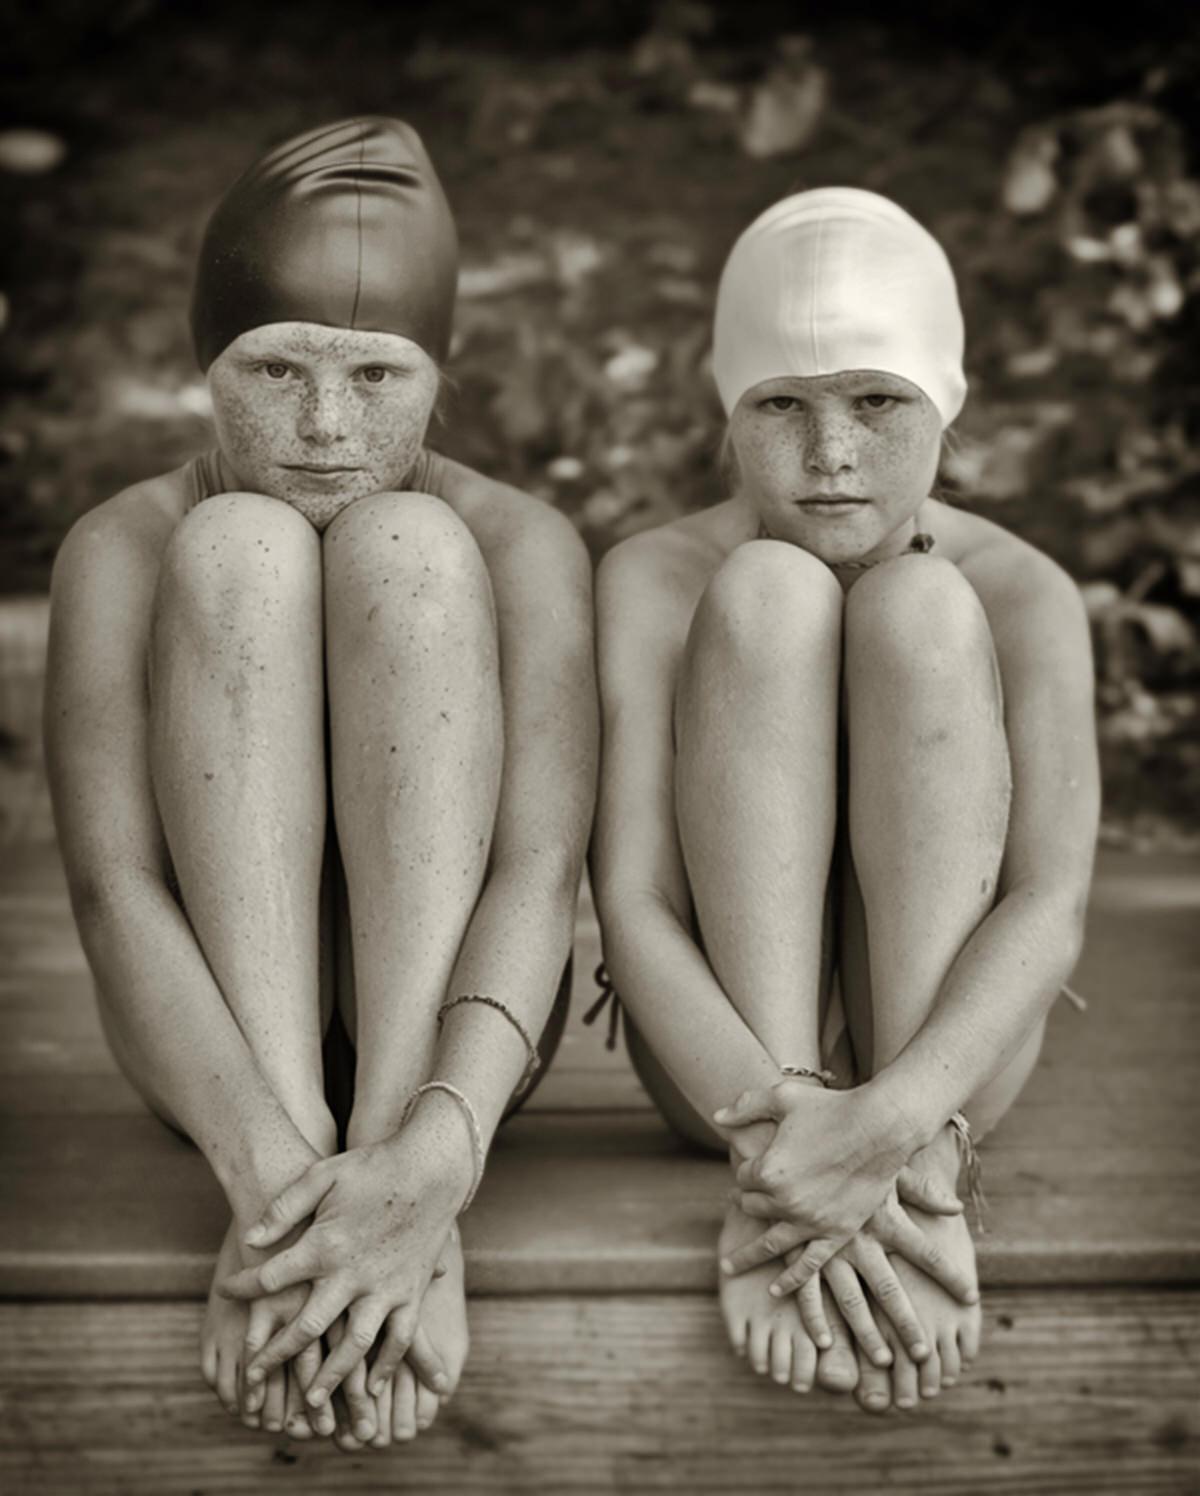 Eilidh and Iona bathing caps